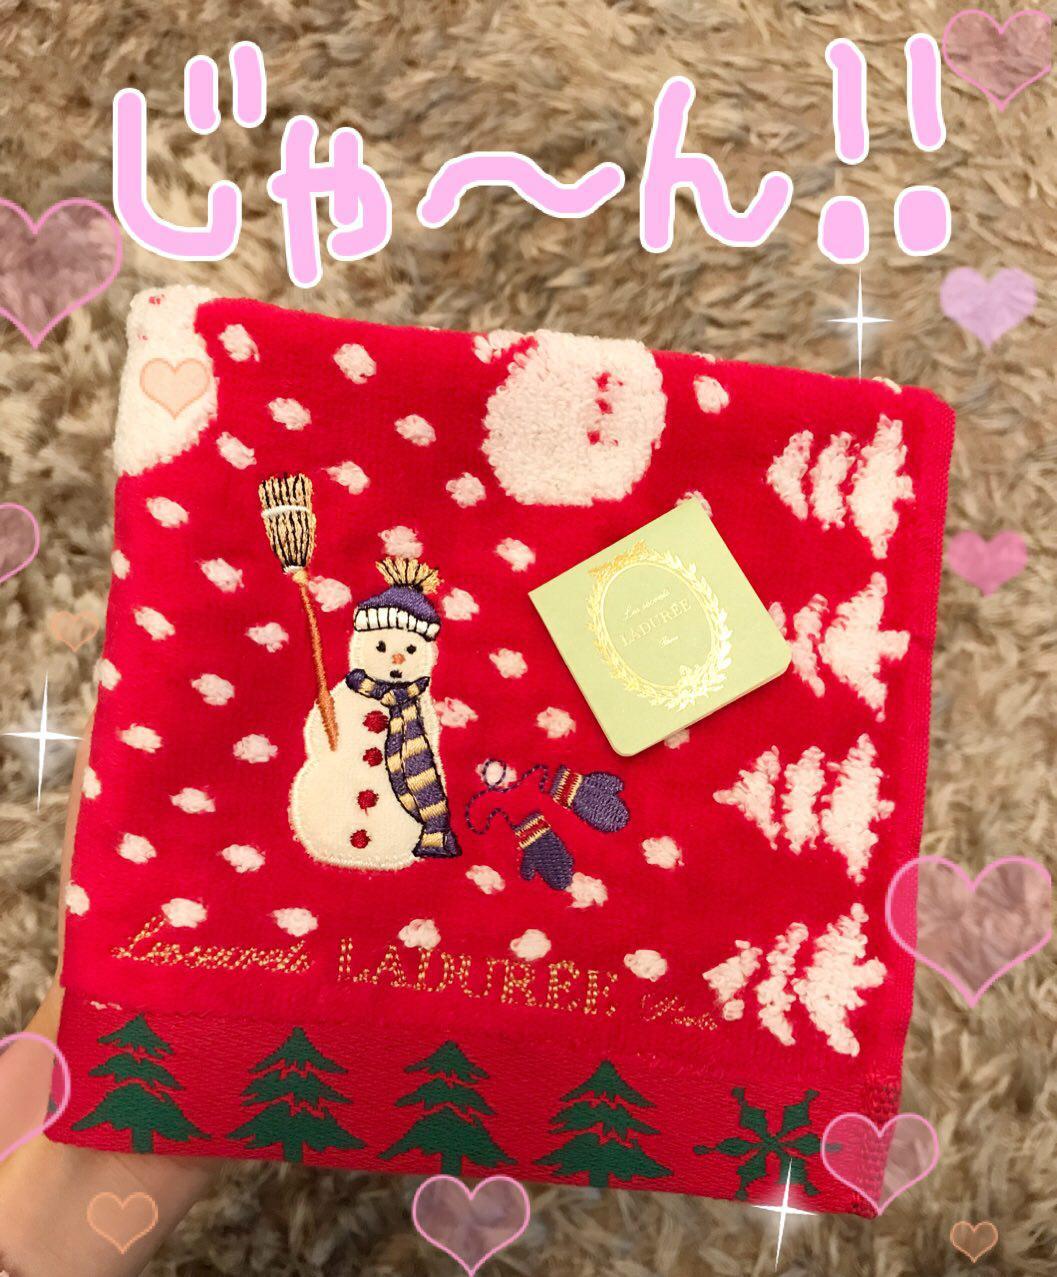 photo_2017-11-18_22-51-28.jpg